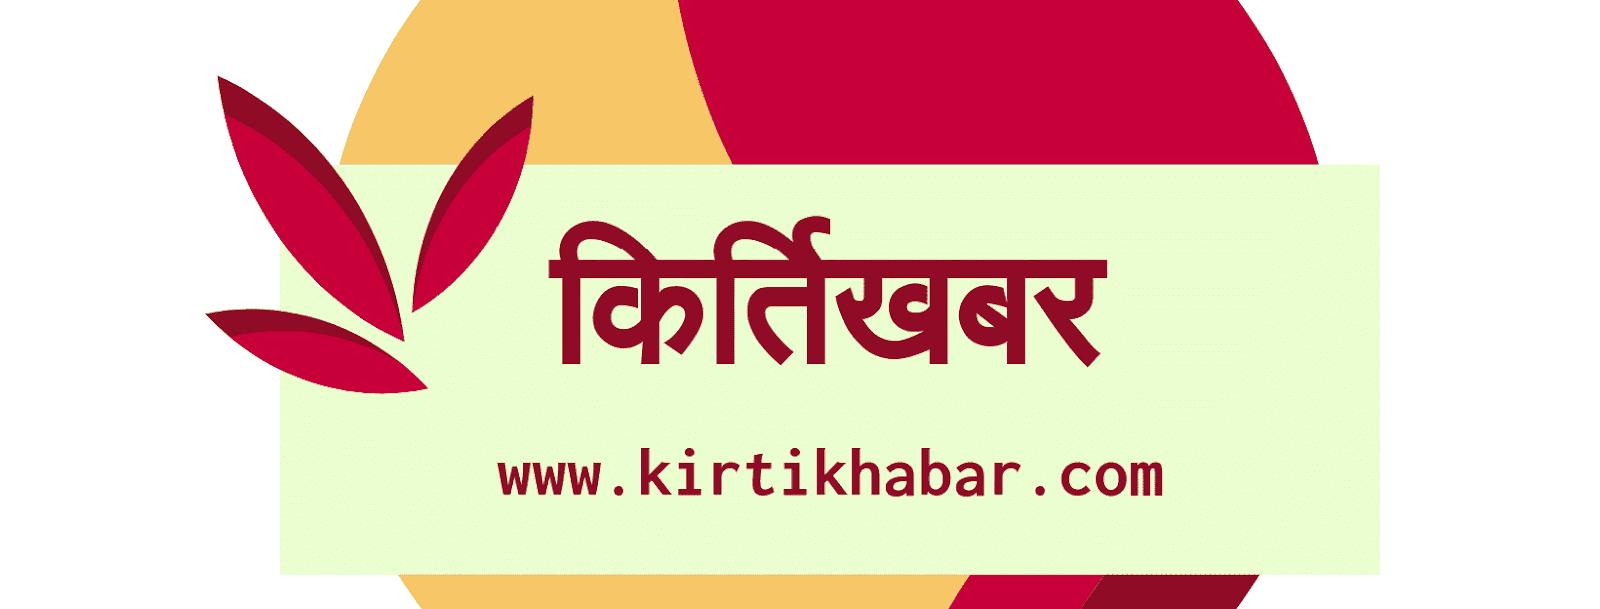 KIRTI-KHABAR